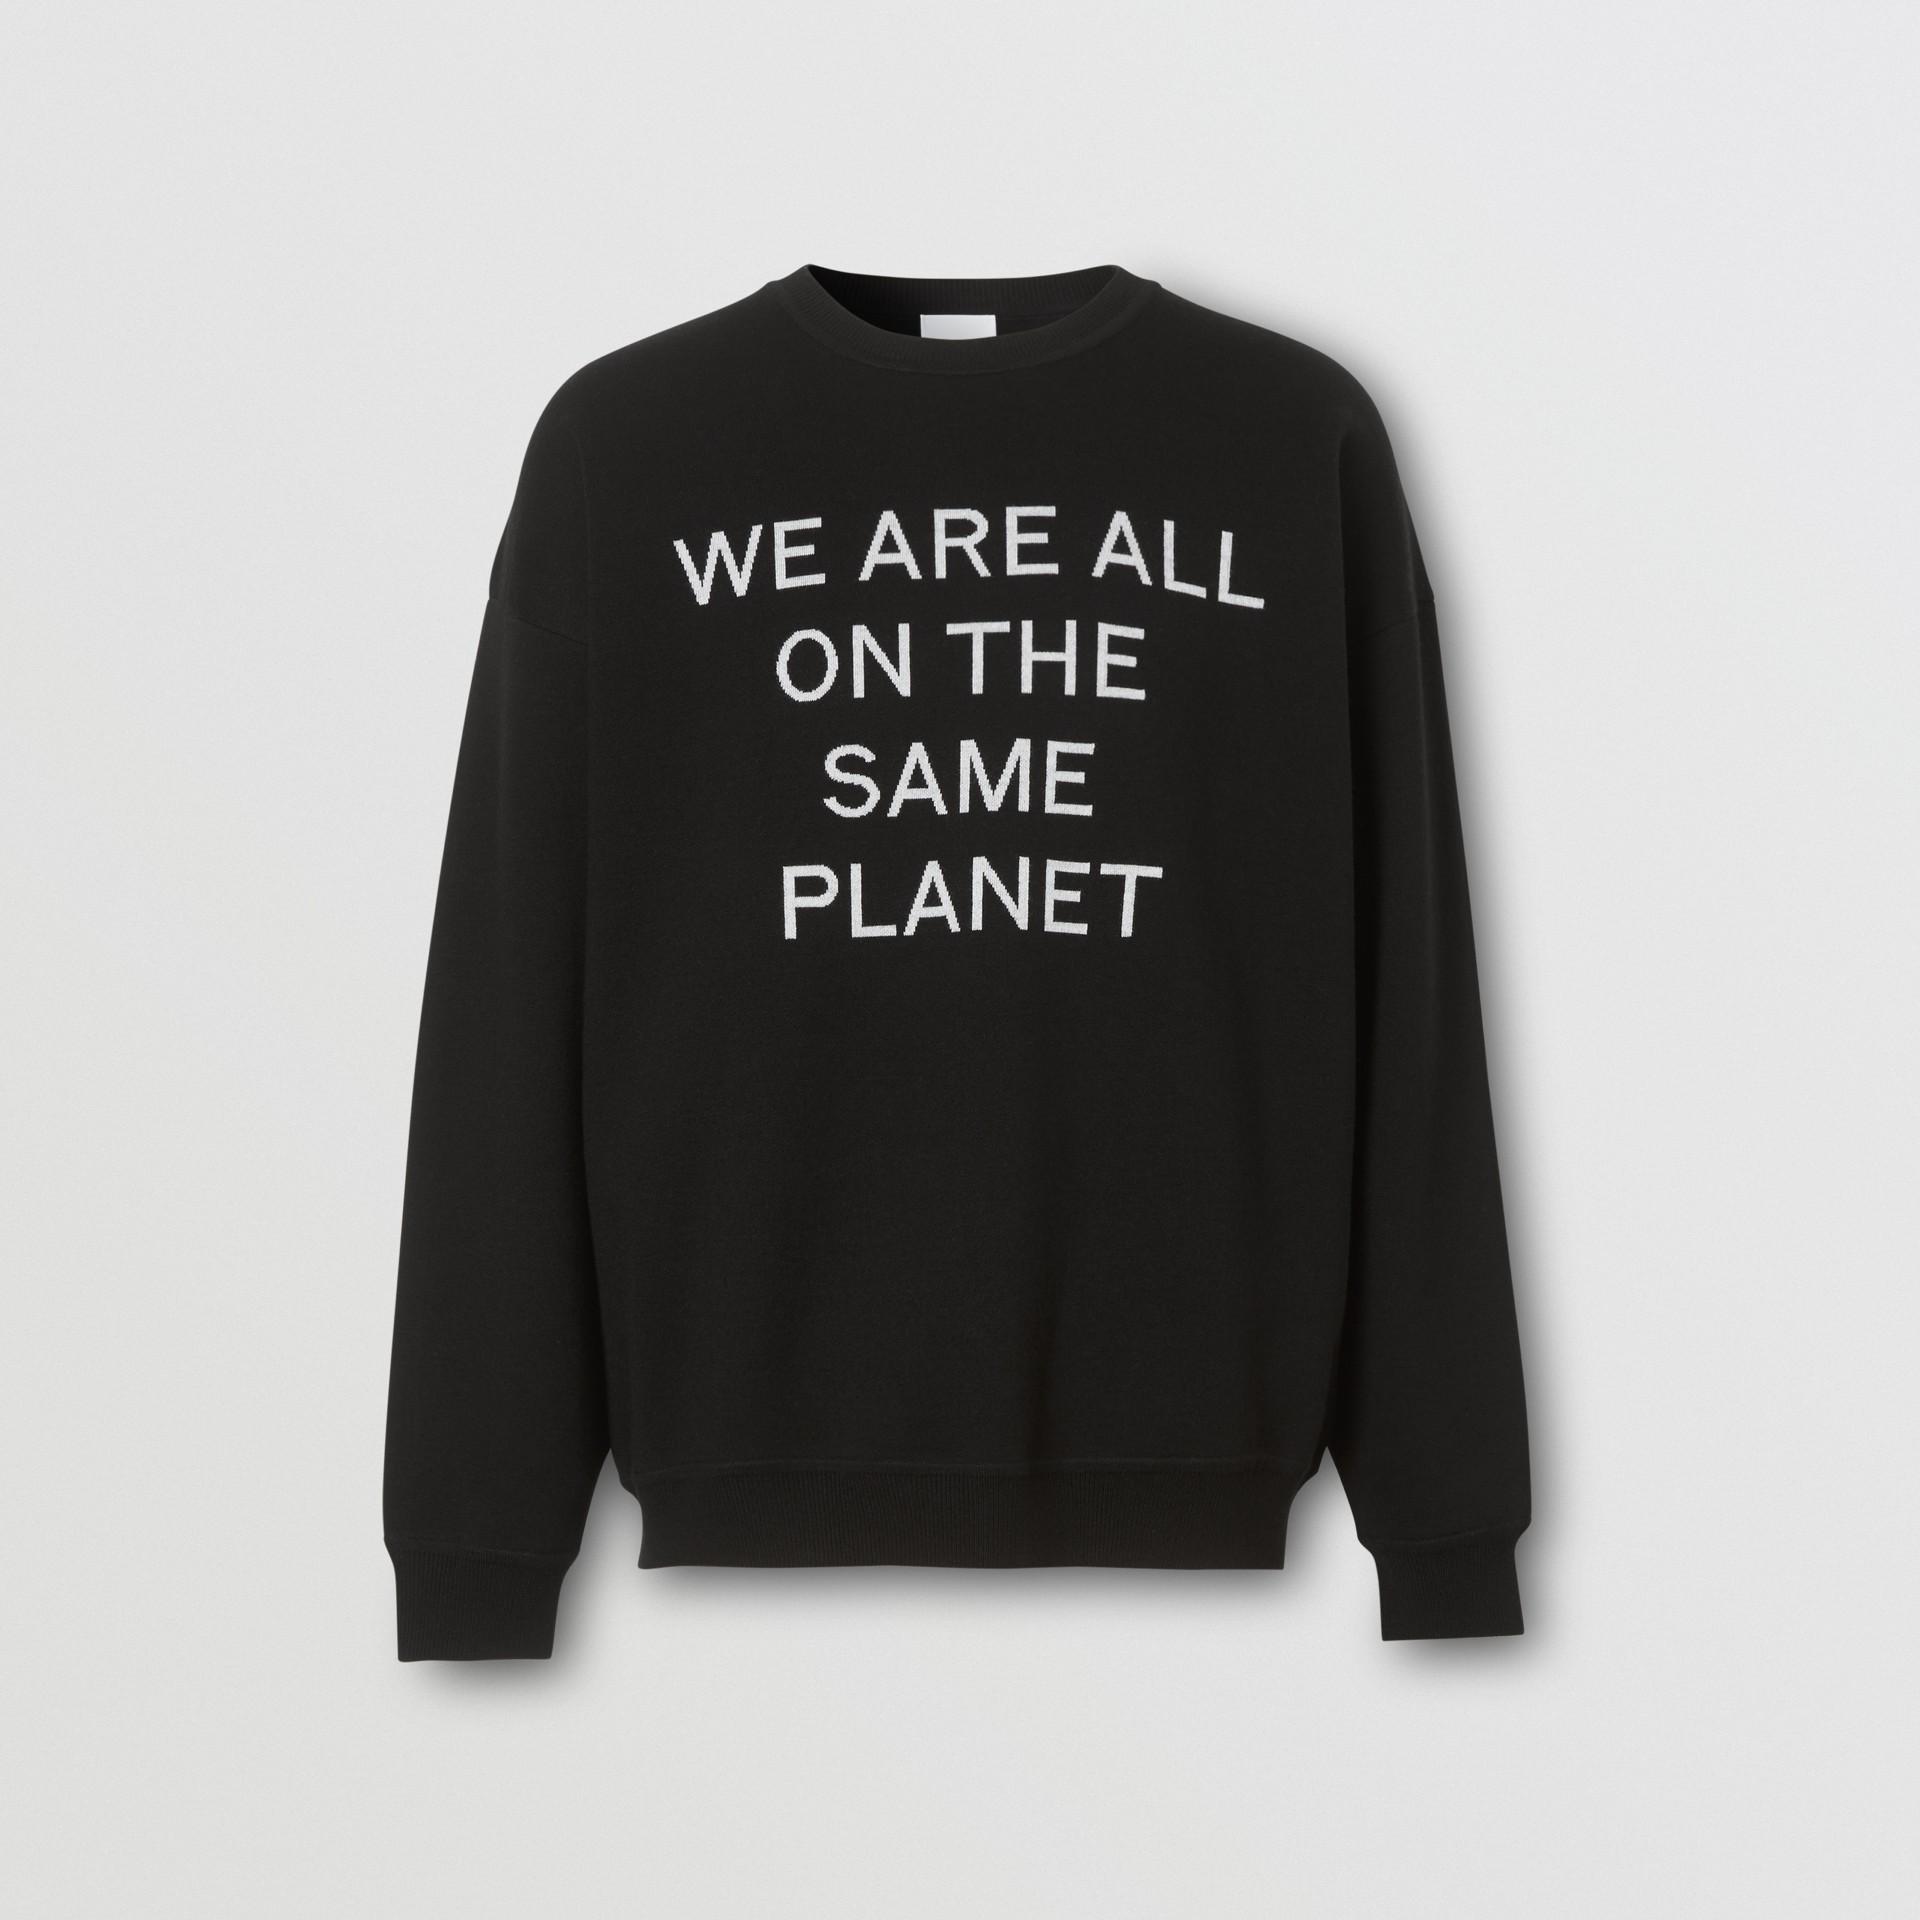 Slogan Intarsia Merino Wool Blend Sweater in Black - Men | Burberry United States - gallery image 3